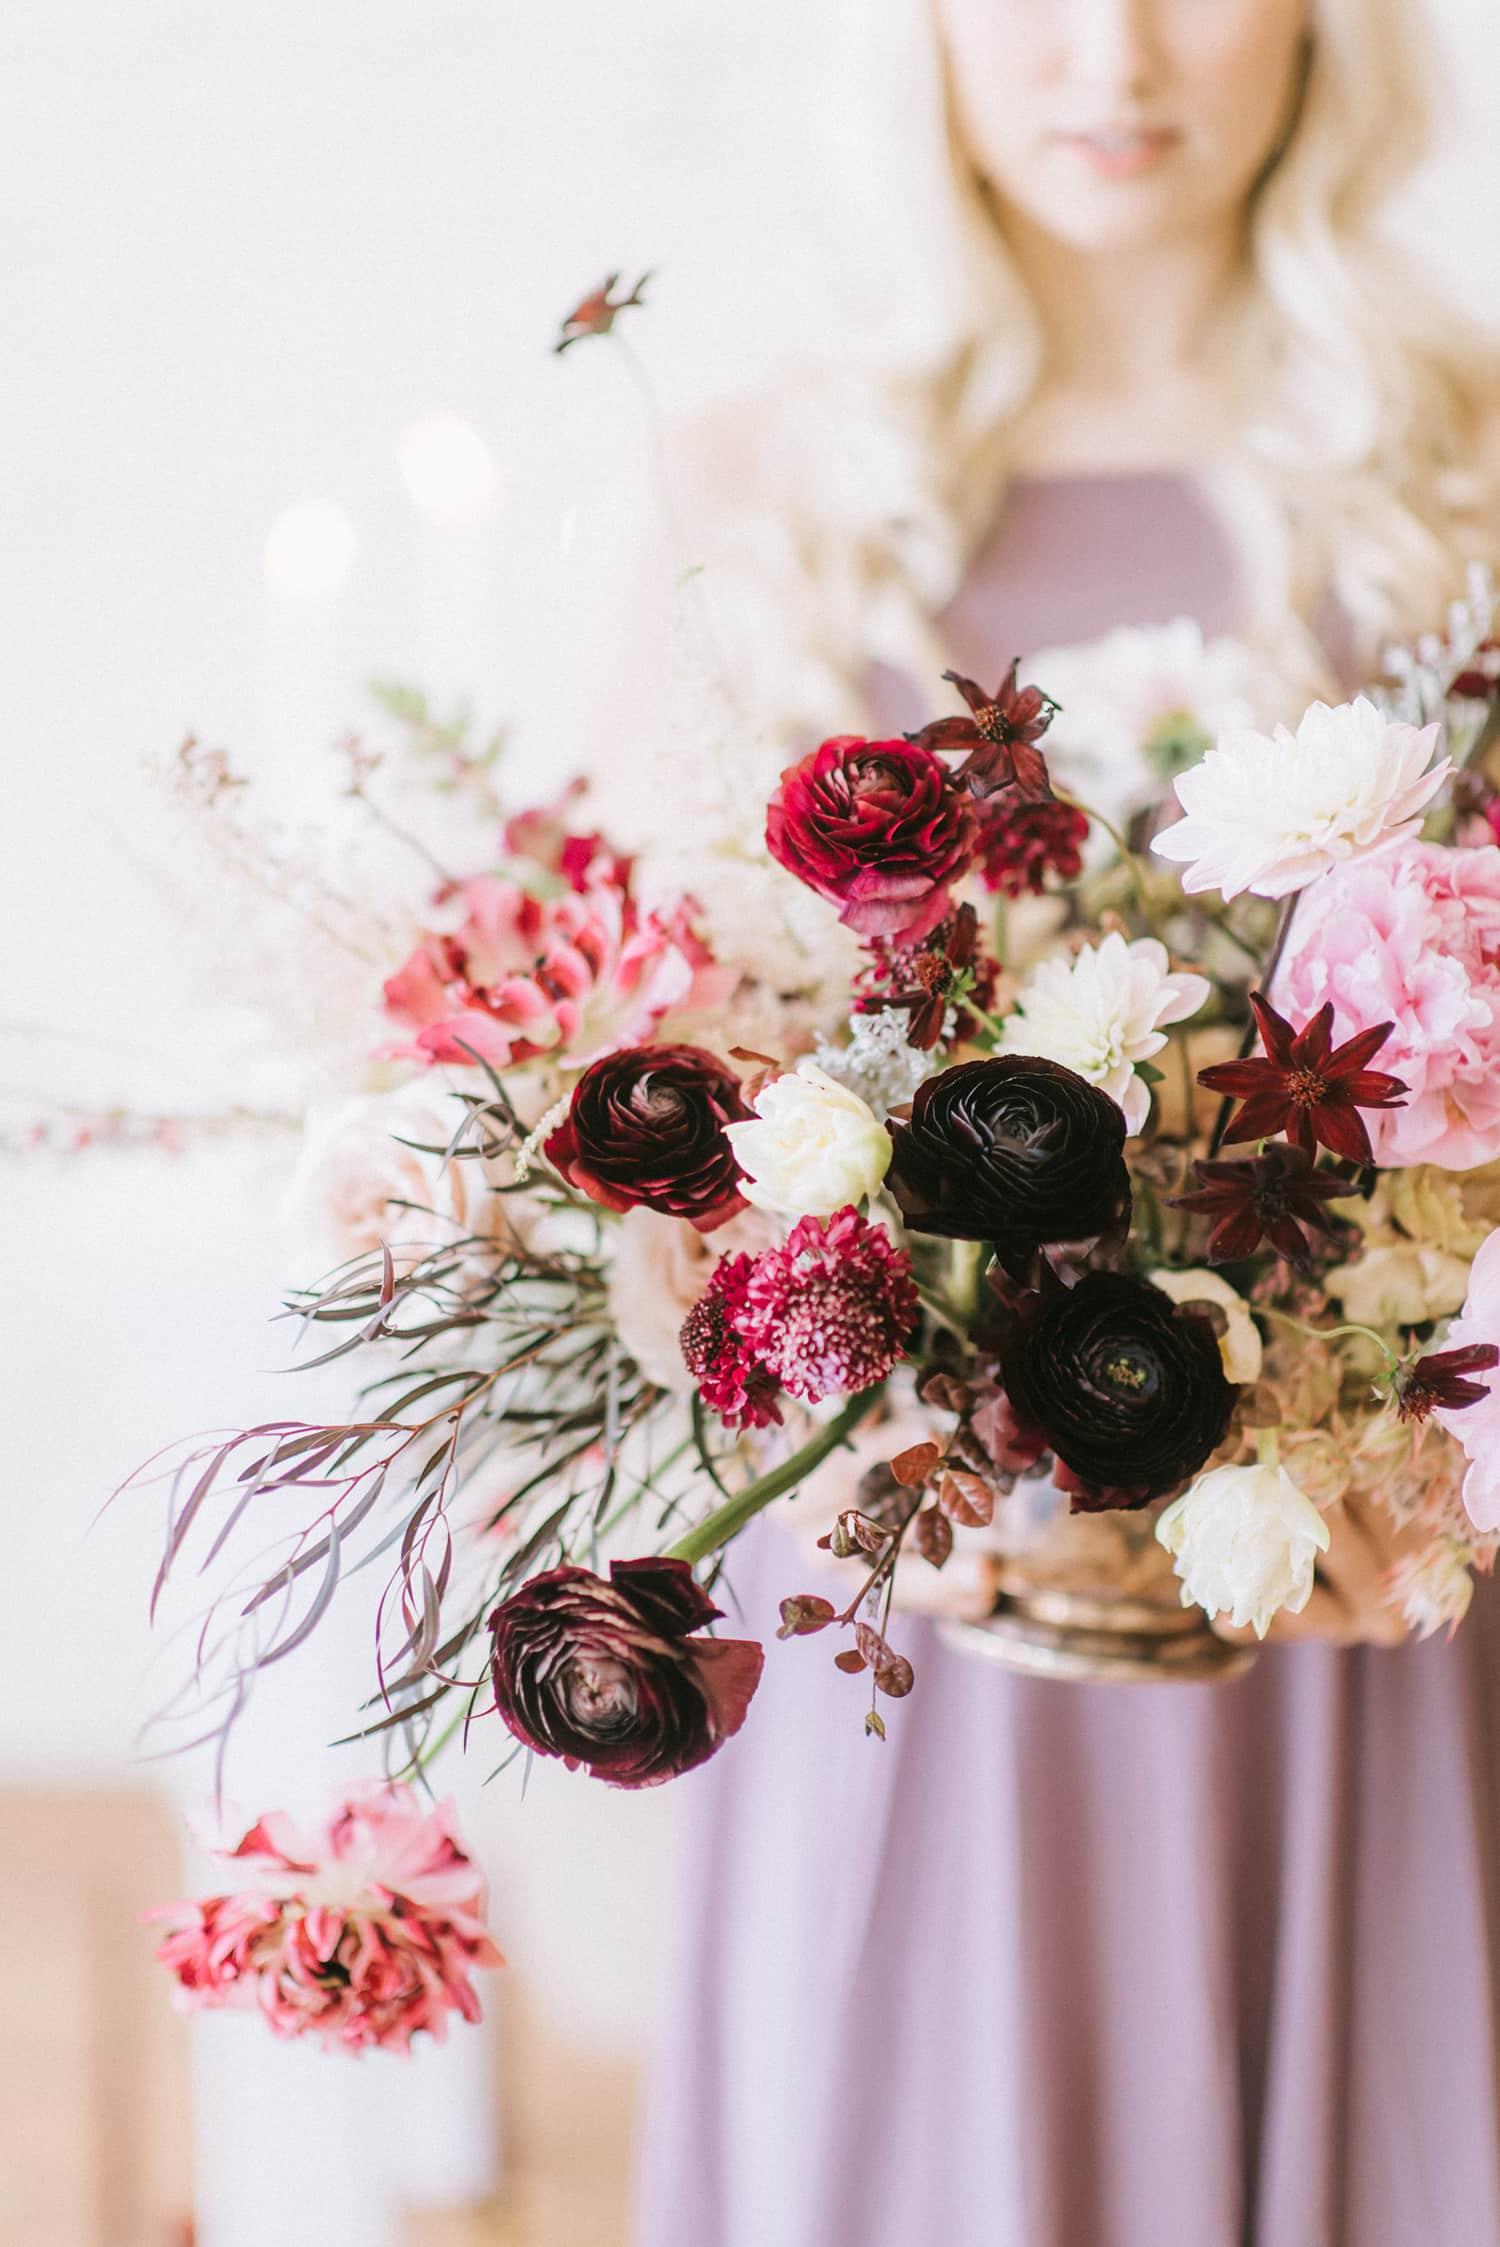 Portland Florist Designs Flowers for Valentine's Day